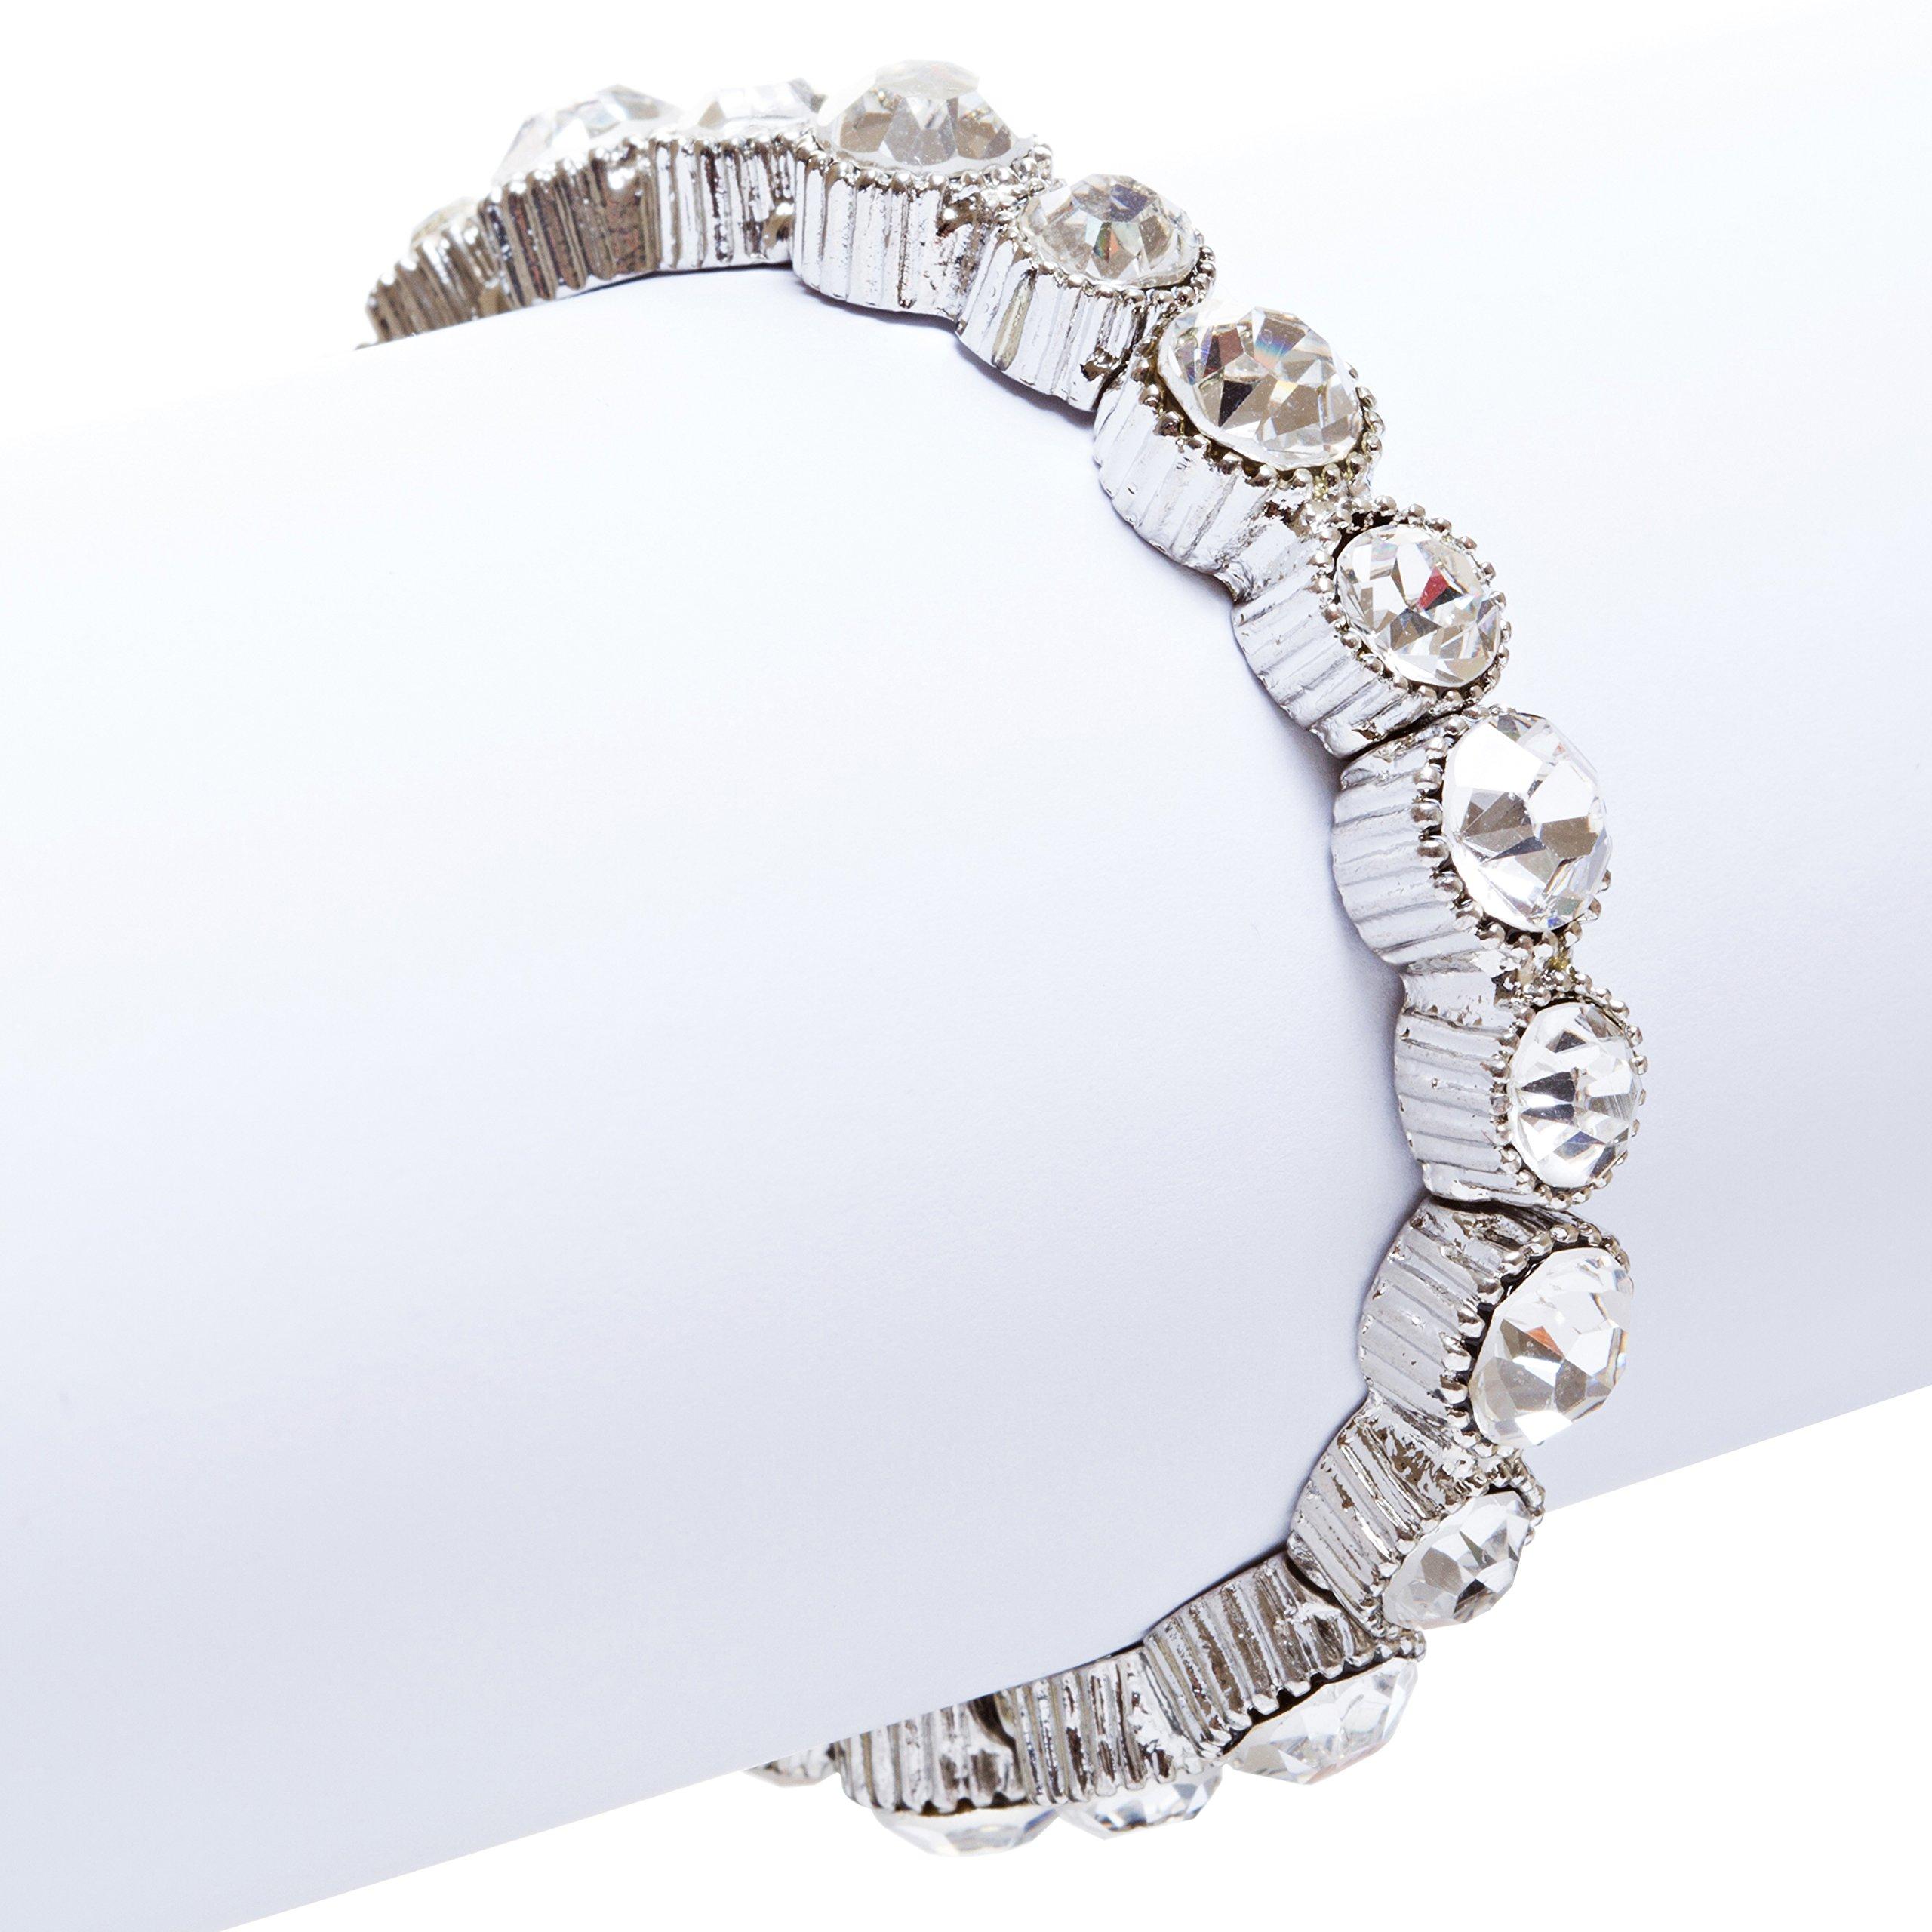 ACCESSORIESFOREVER Women Bridal Wedding Jewelry Crystal Rhinestone Simple Yet Elegant Bracelet B308 SV by Accessoriesforever (Image #2)